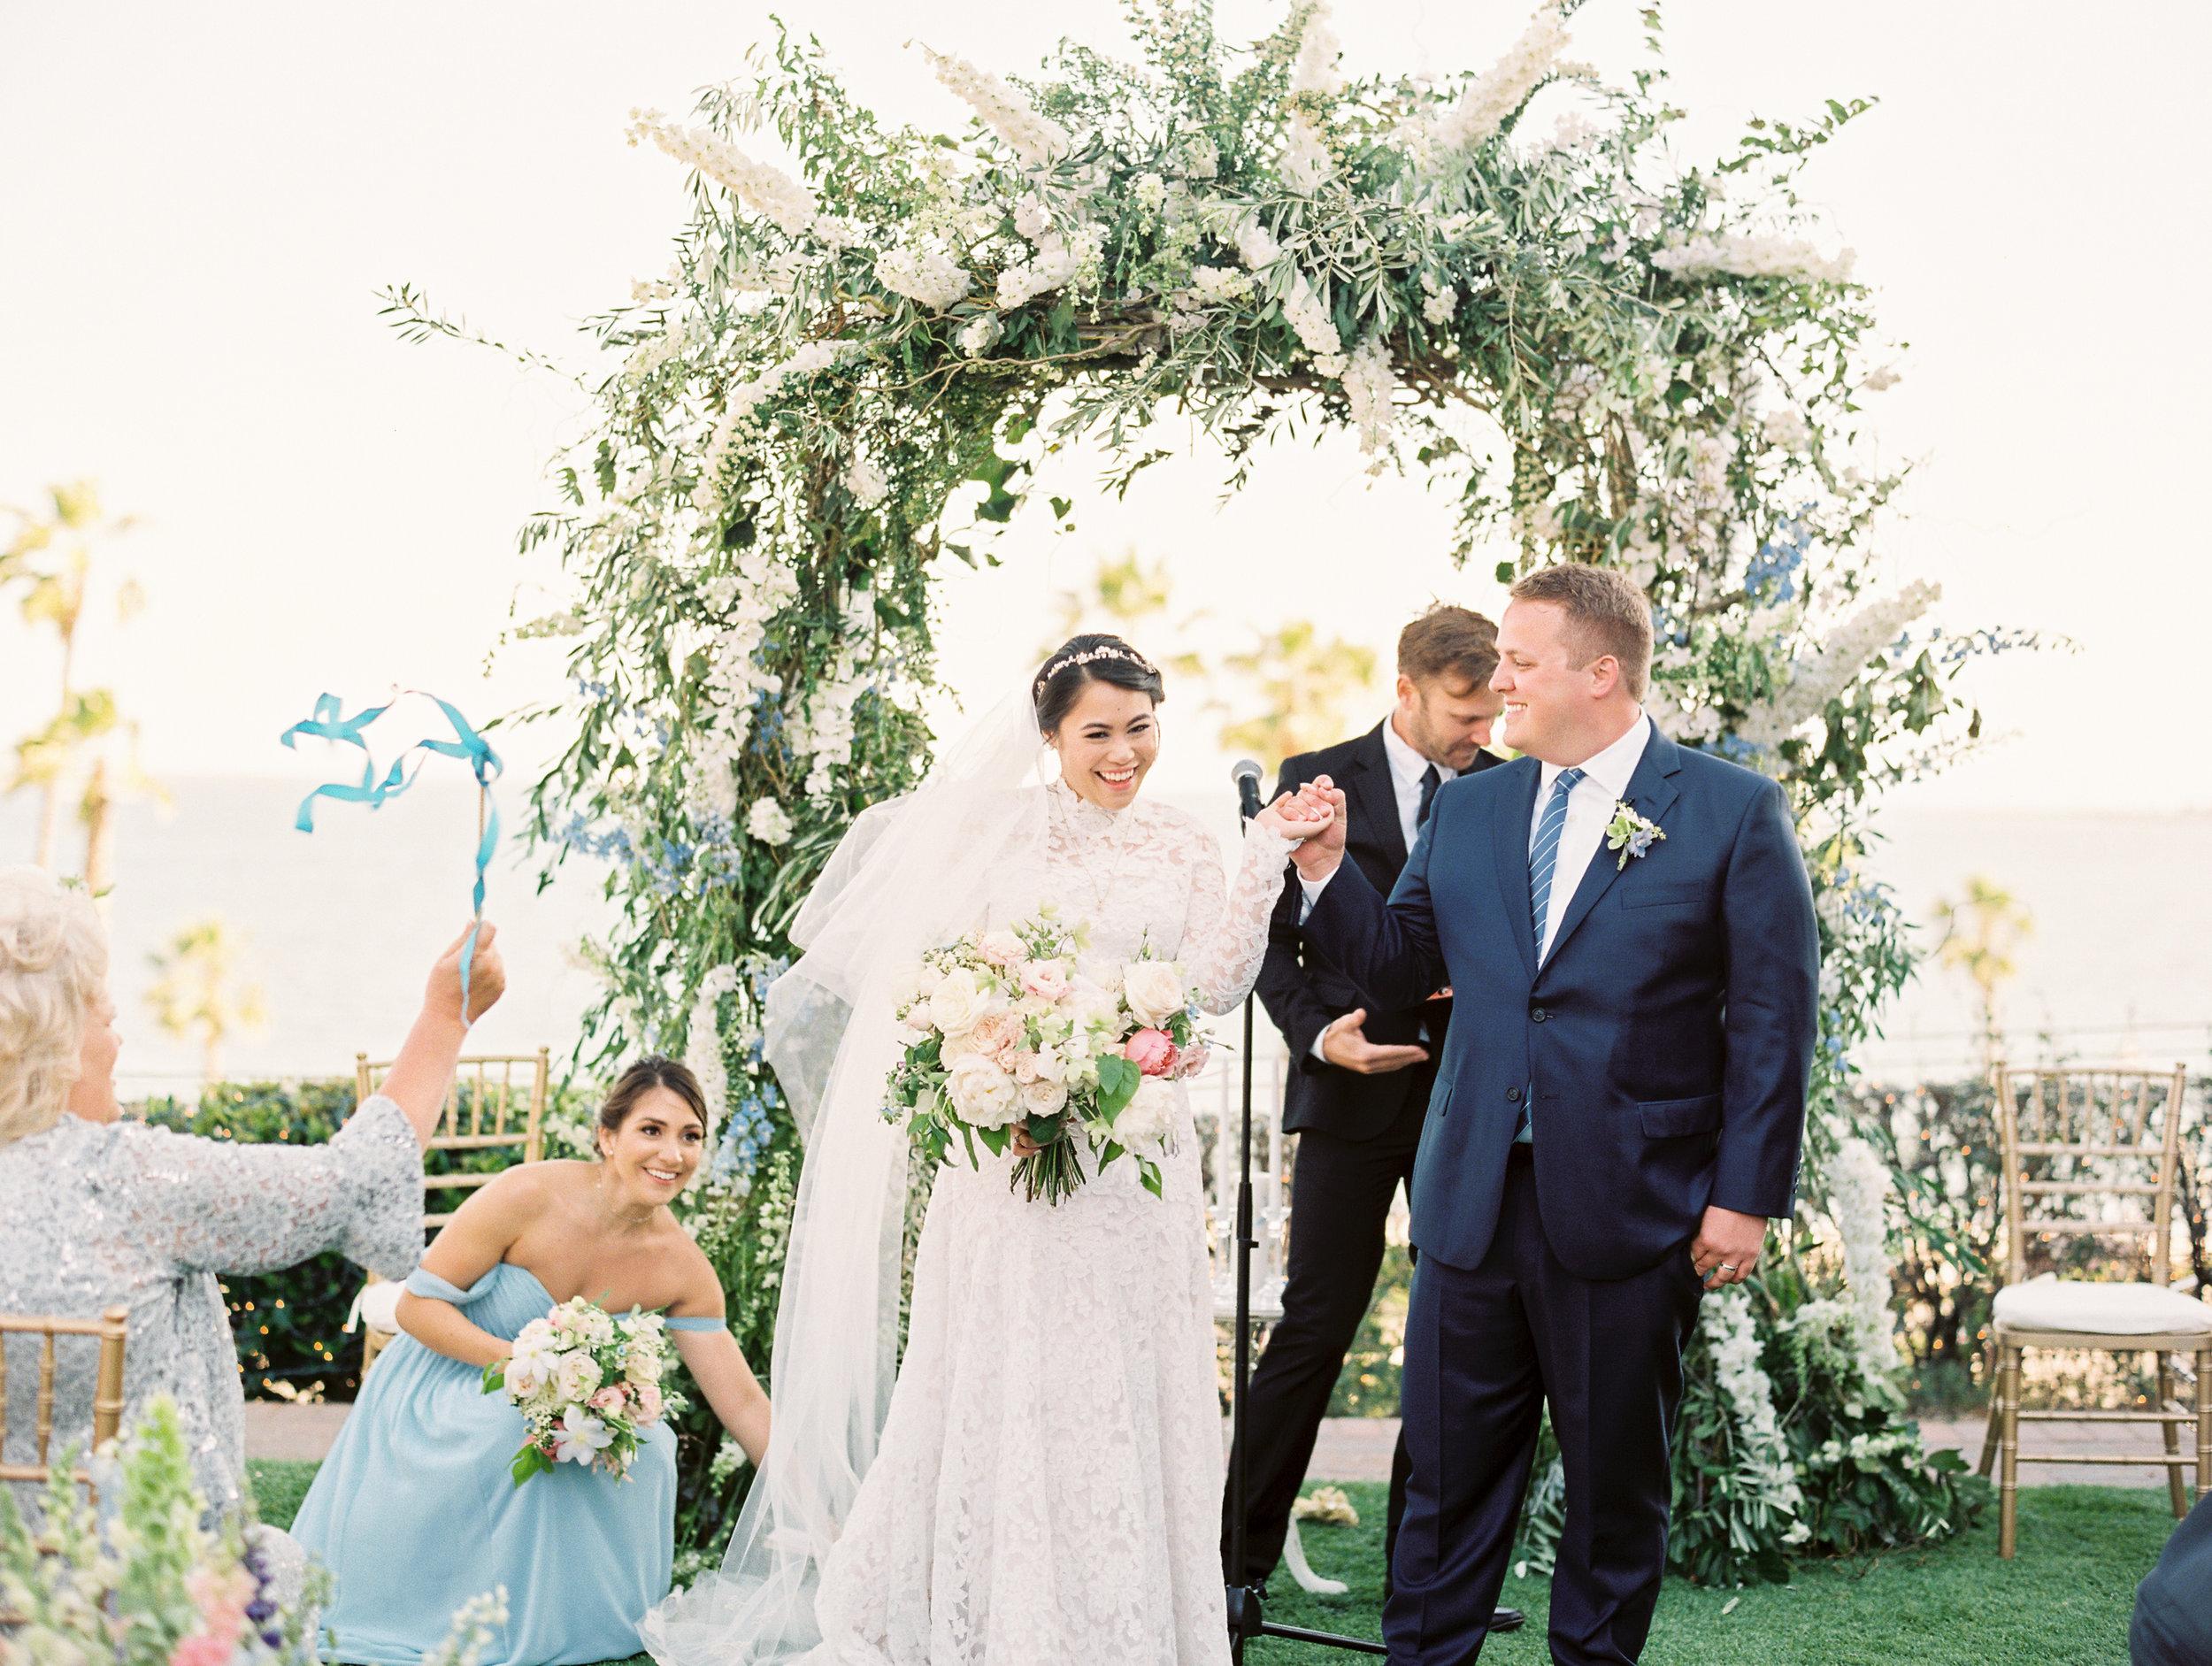 long-beach-museum-of-art-wedding-planner-luxury-wedding-planner-socal64.jpg